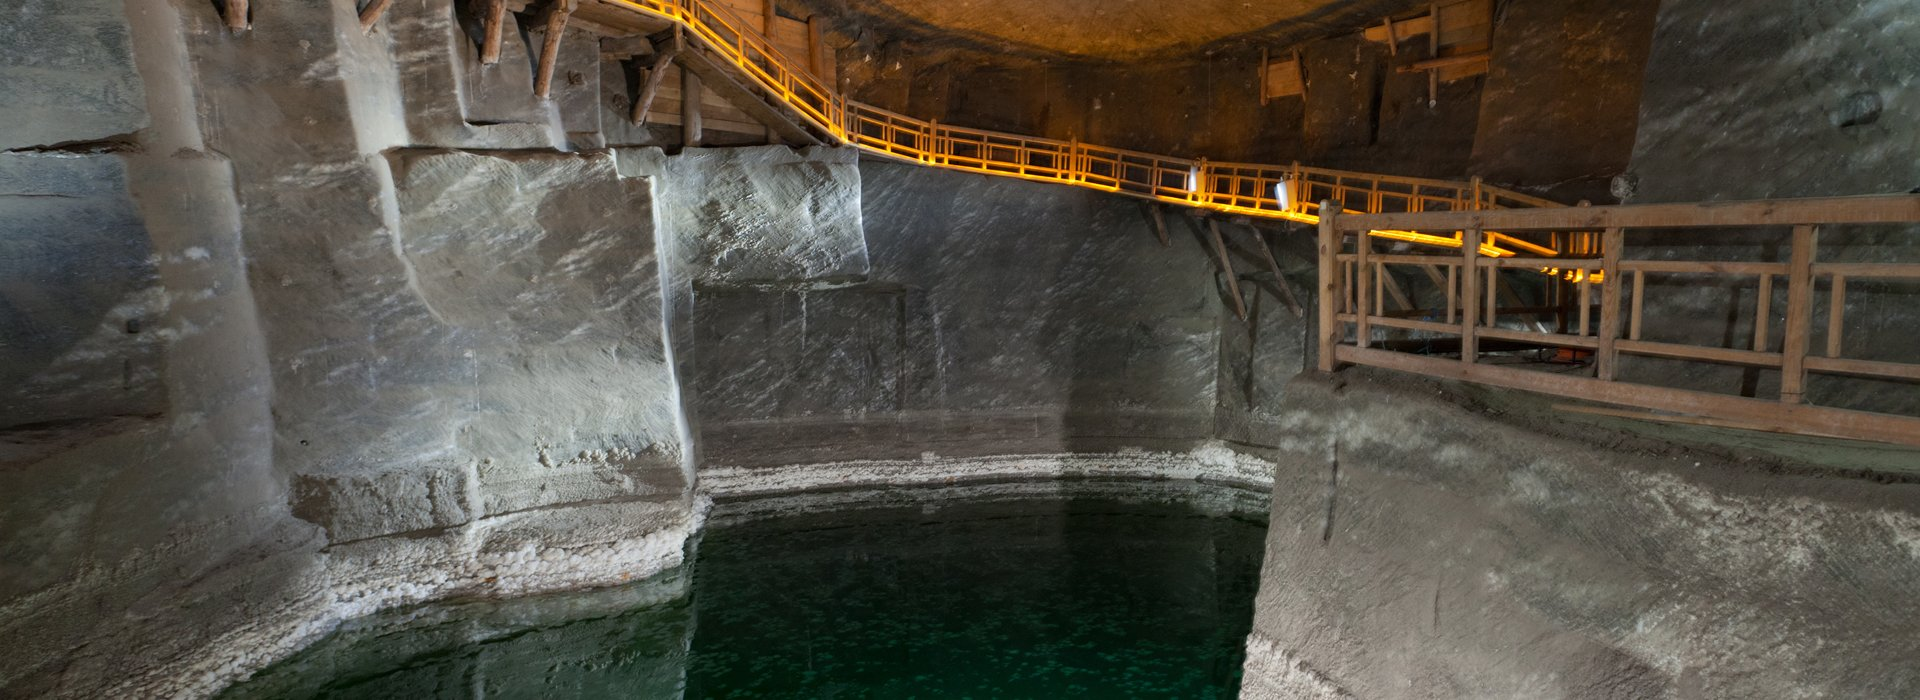 Salt in Salt Mine Wieliczka